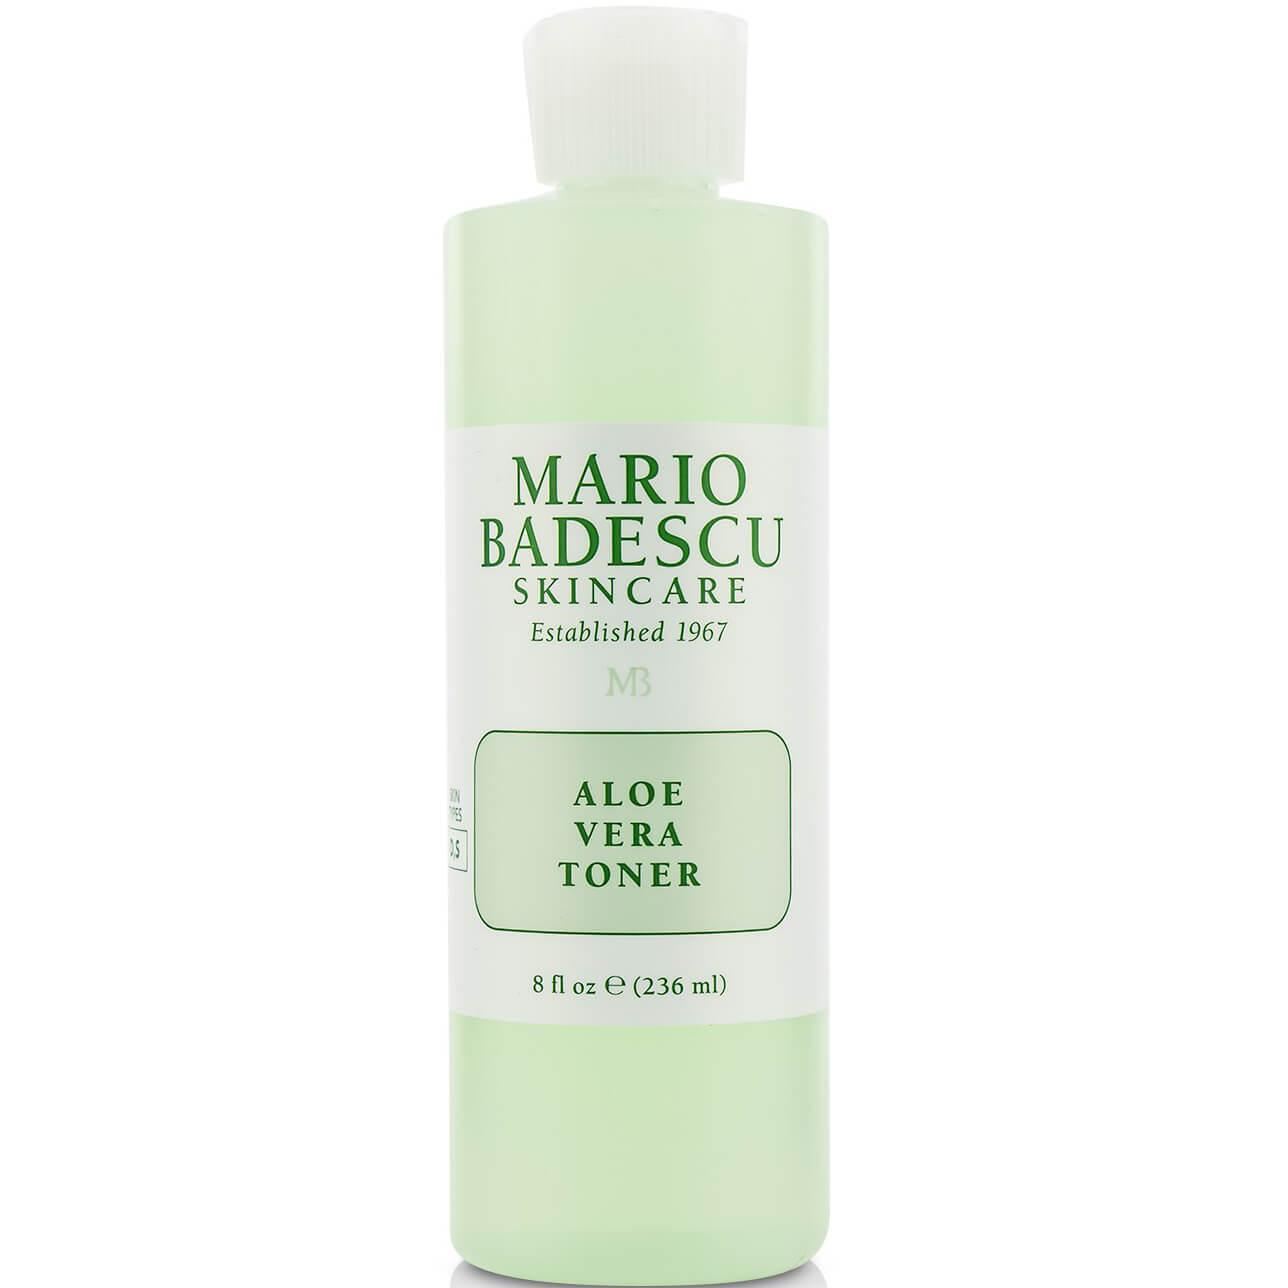 Mario Badescu Scincare Aloe Vera Toner Απαλή Λοσιόν Καθαρισμού Χωρίς Οινόπνευμα Ιδανική για Ευαίσθητες Επιδερμίδες 236ml